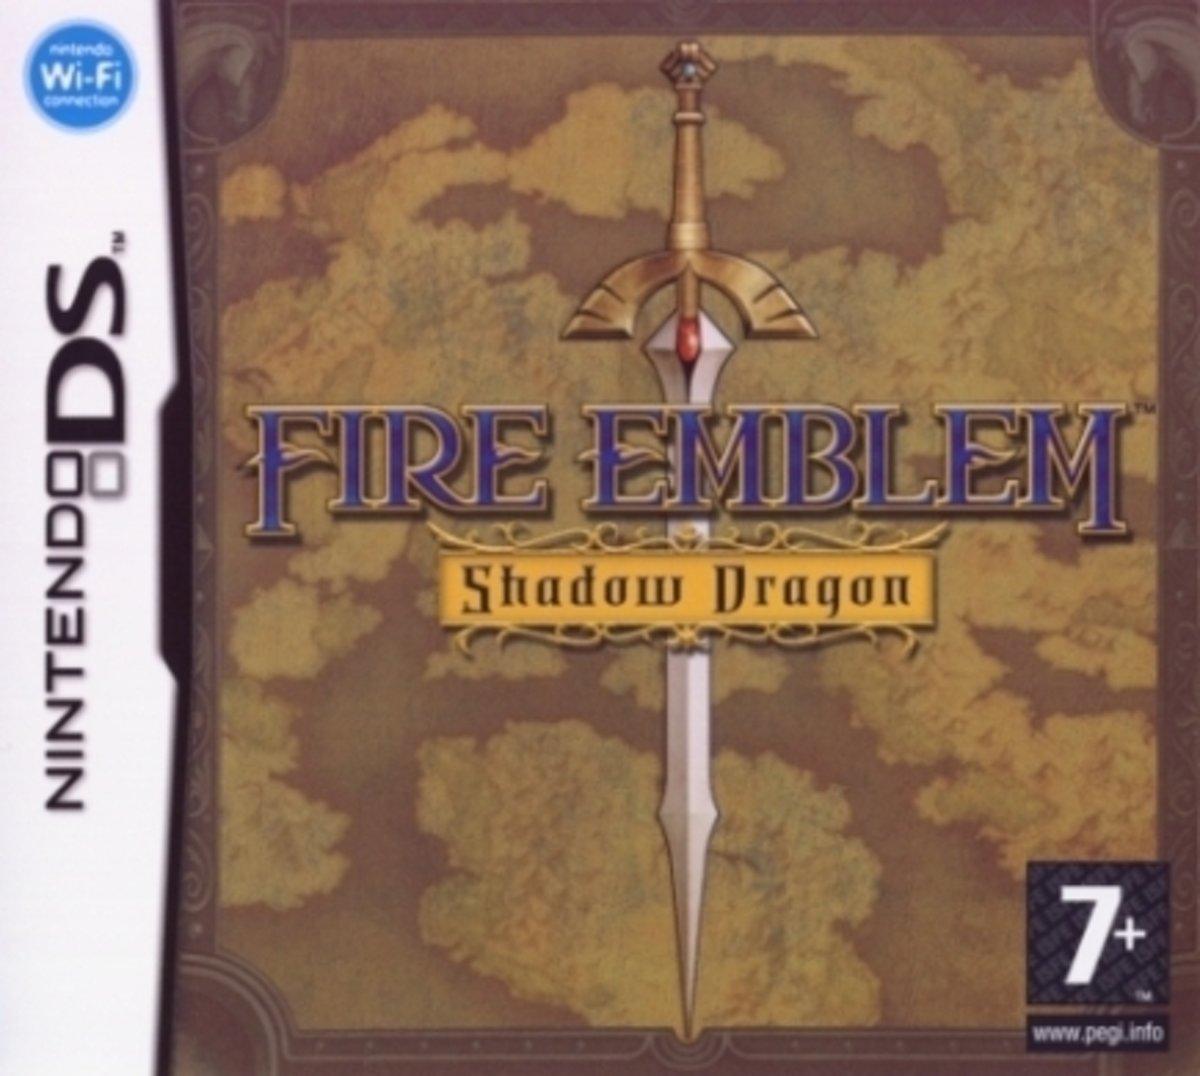 Fire Emblem: Shadow Dragon kopen